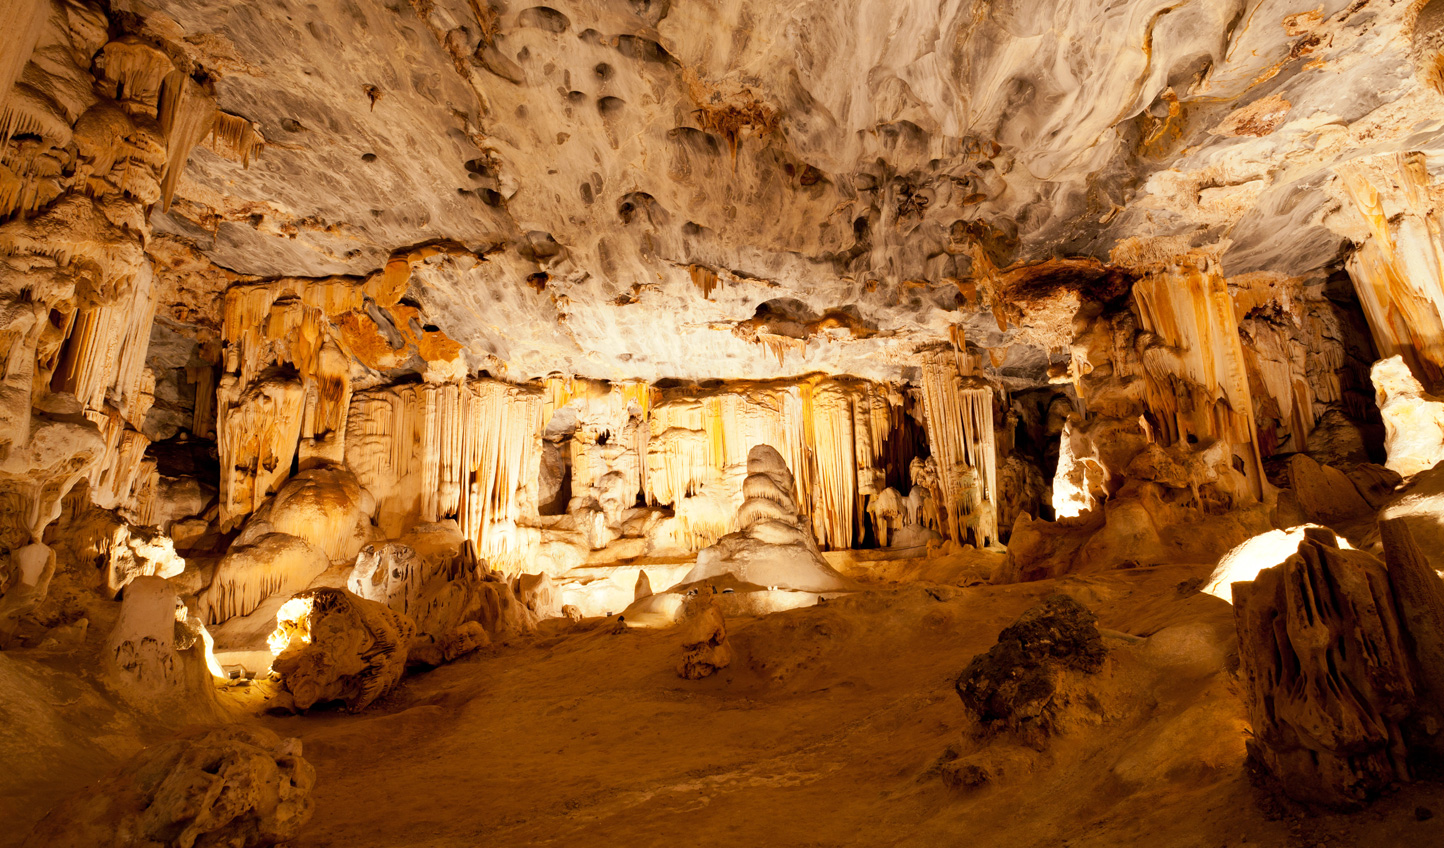 Venture through the Cango Caves